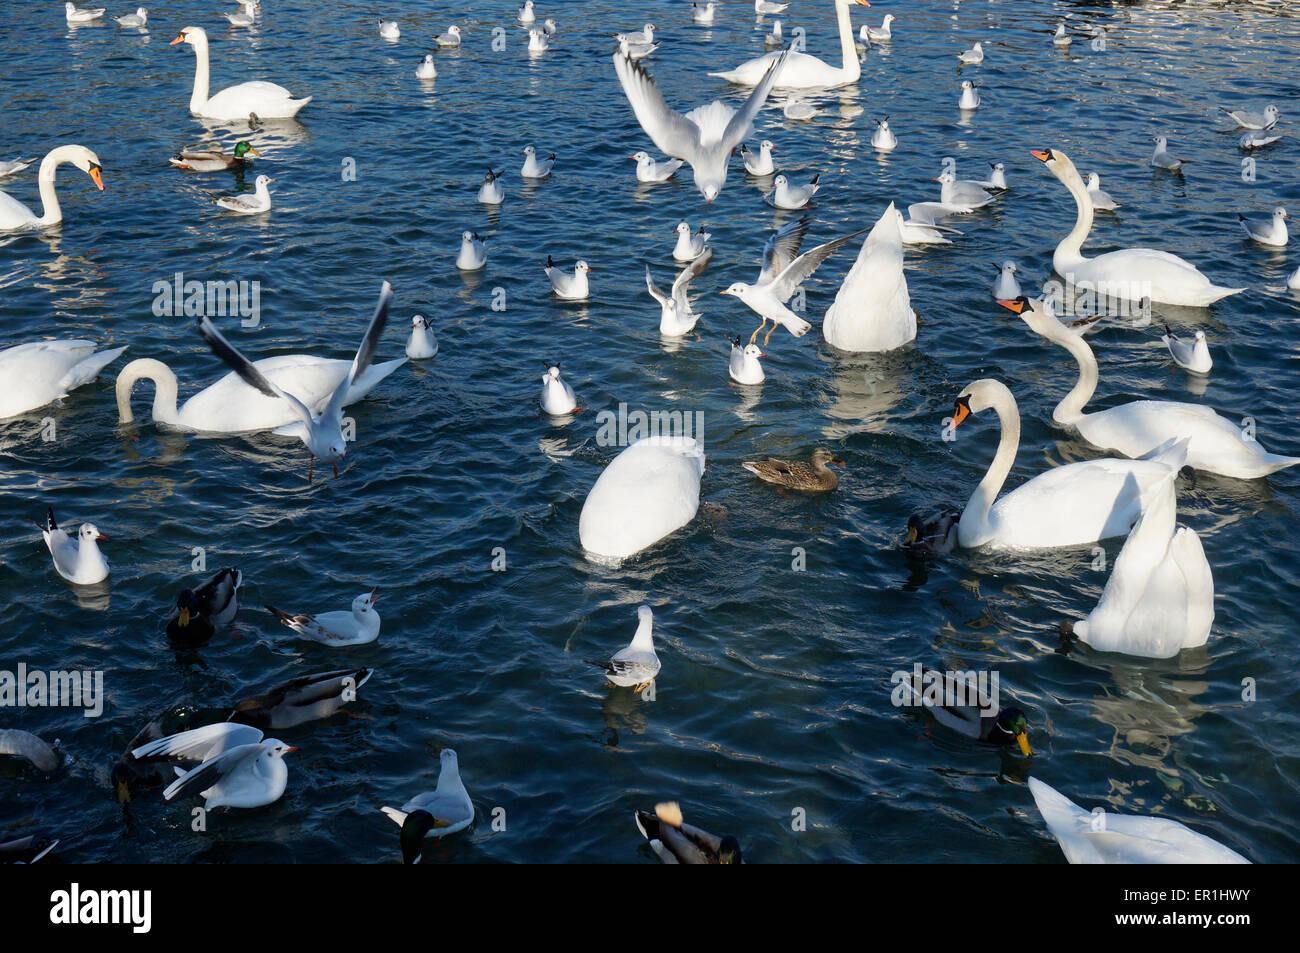 Waterfowl - Stock Image